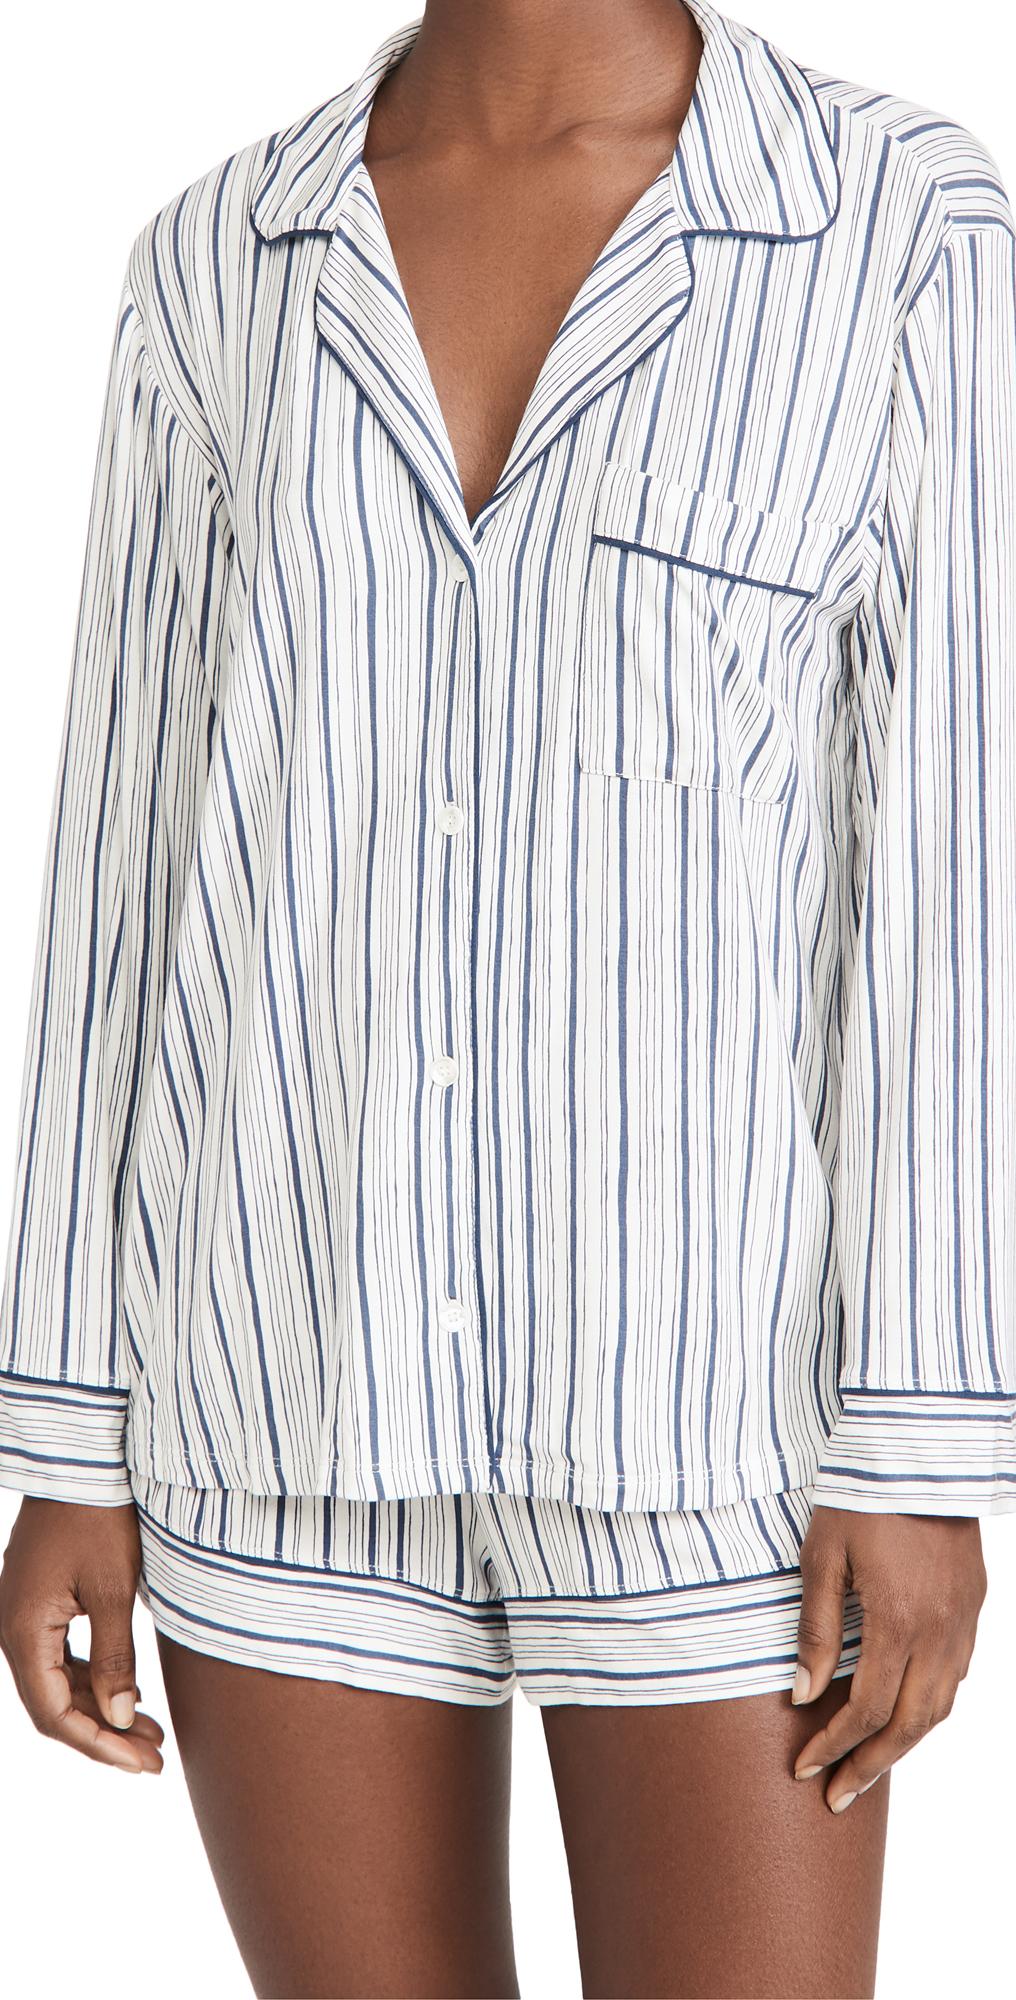 Eberjey Gisele Printed Long Sleeve PJ Set